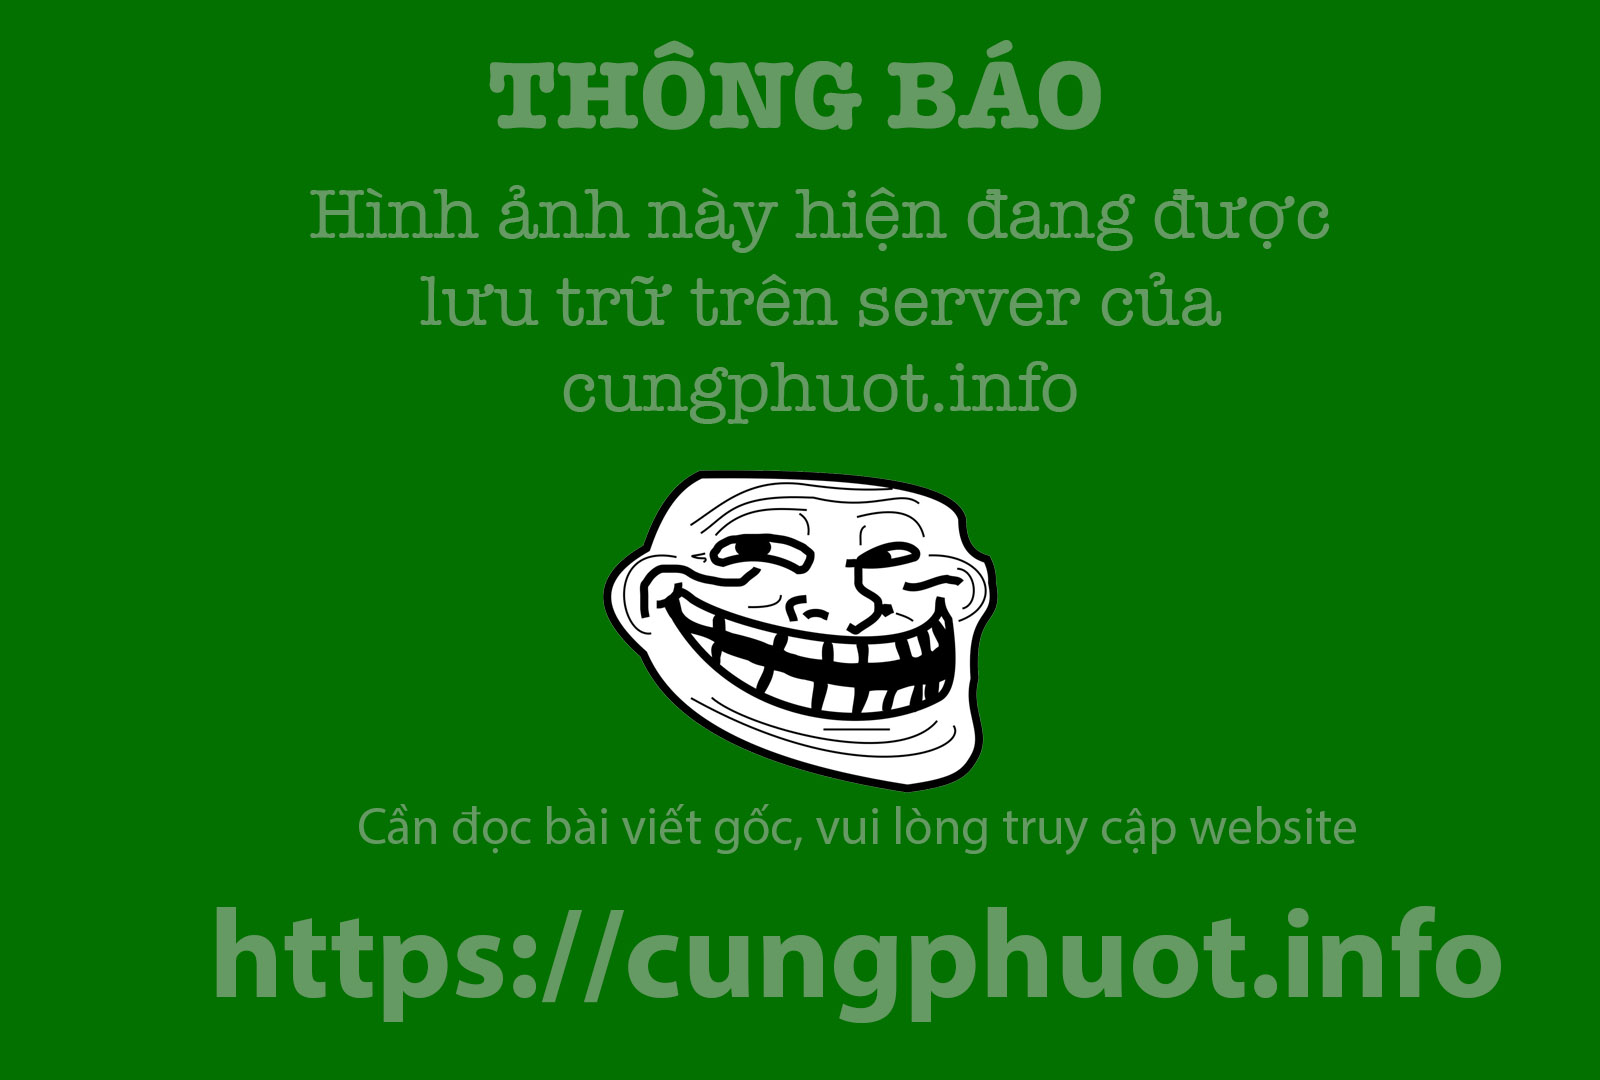 Ve dep thanh cao, huyen bi cua Dan vien Chau Son hinh anh 10